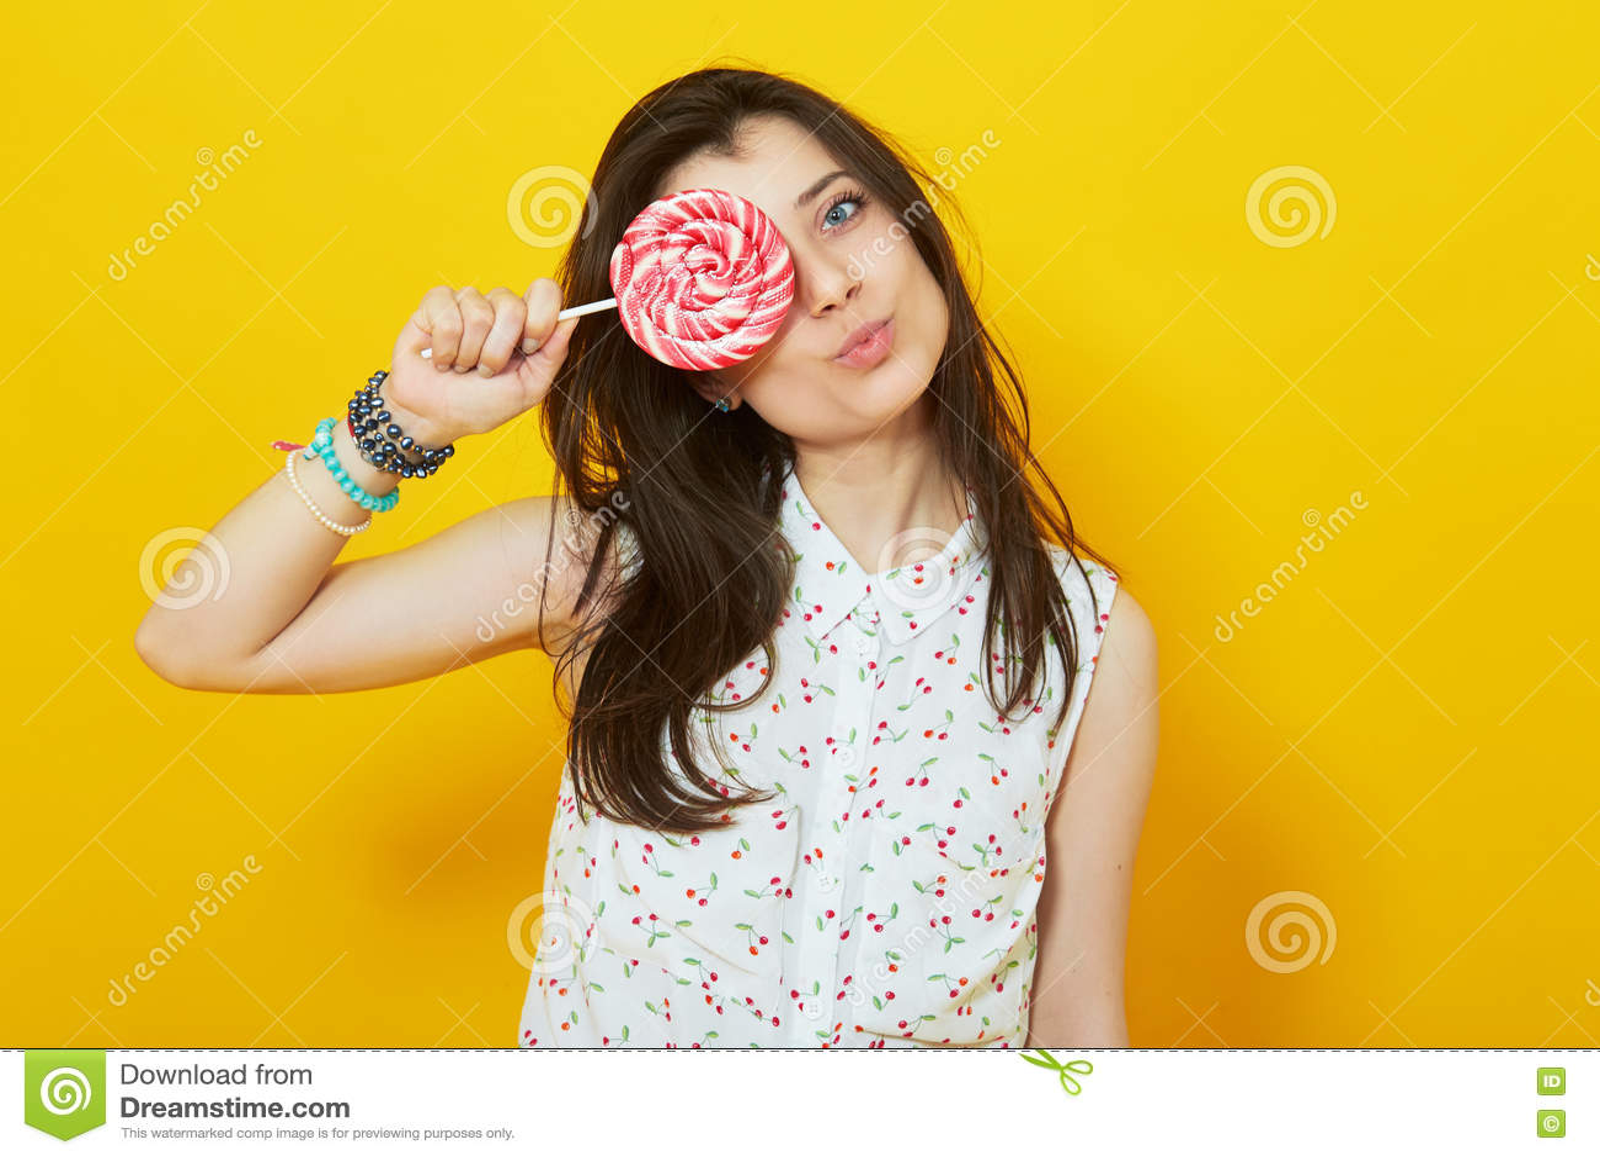 Teenage girl on bright vivid yellow background holding lollipop